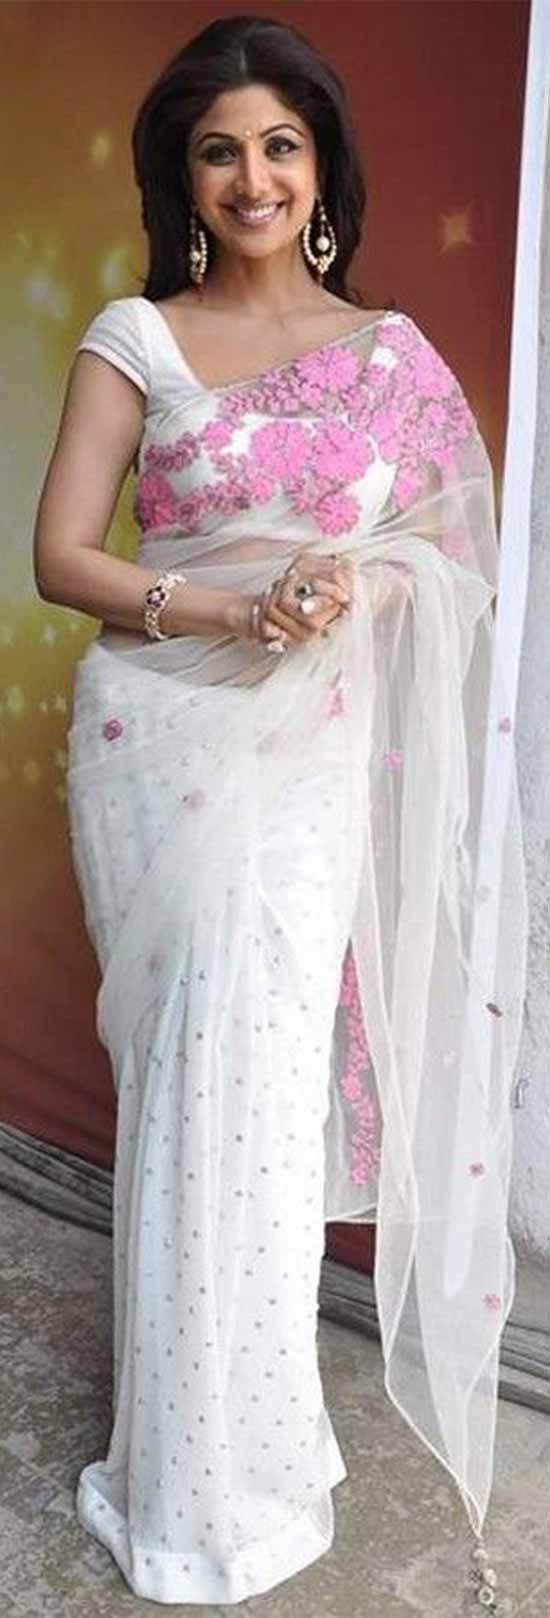 Shilpa-Shetty-White-Net-with-Pink-Work-Replica-Saree-Fabric